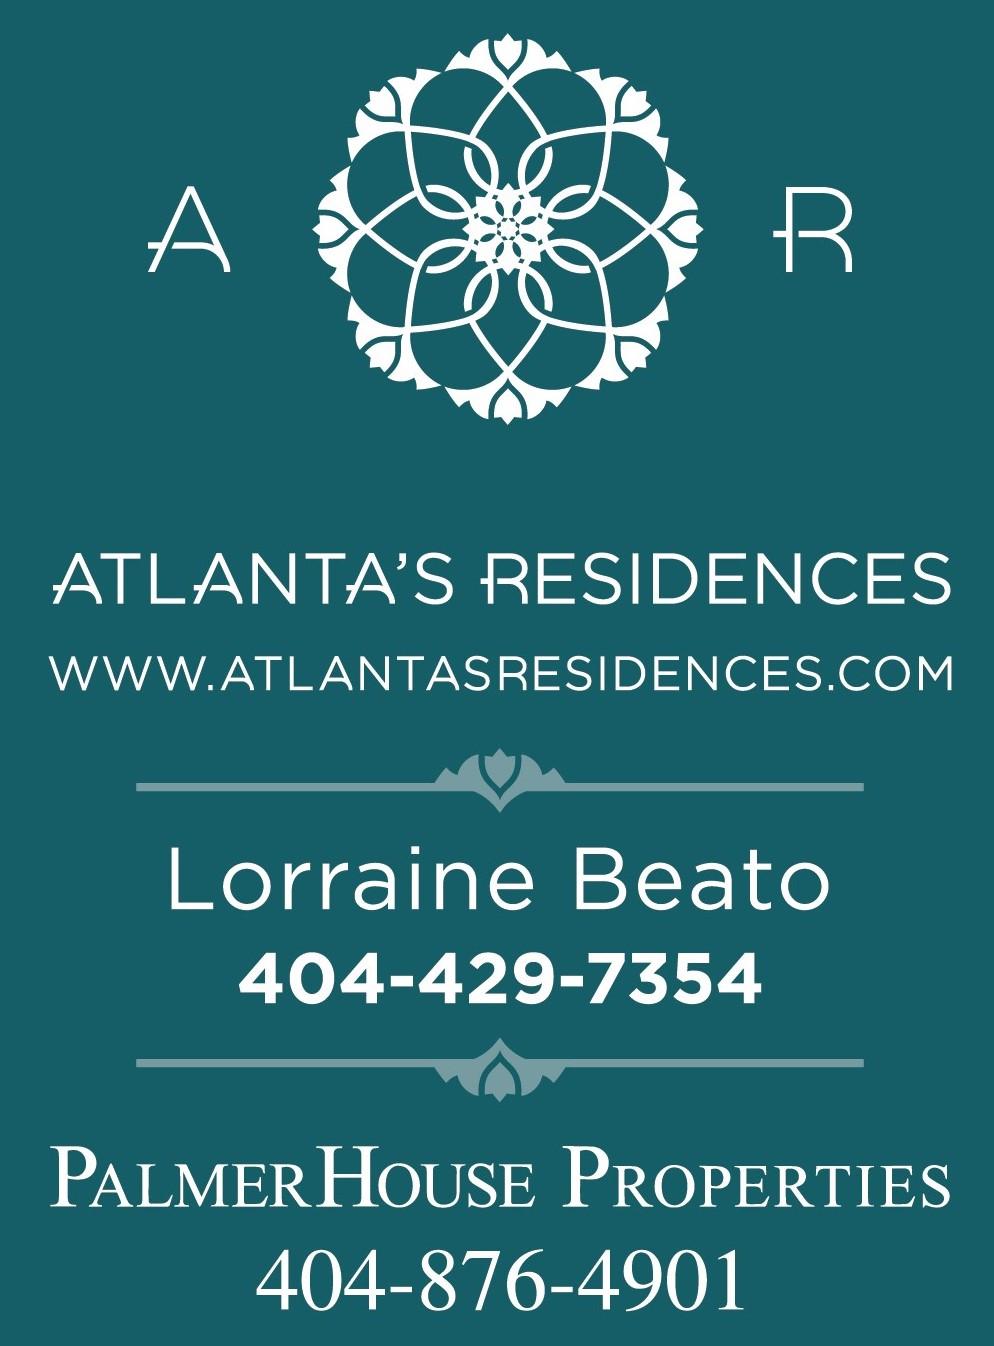 Atlanta Residences - Palmer House Properties